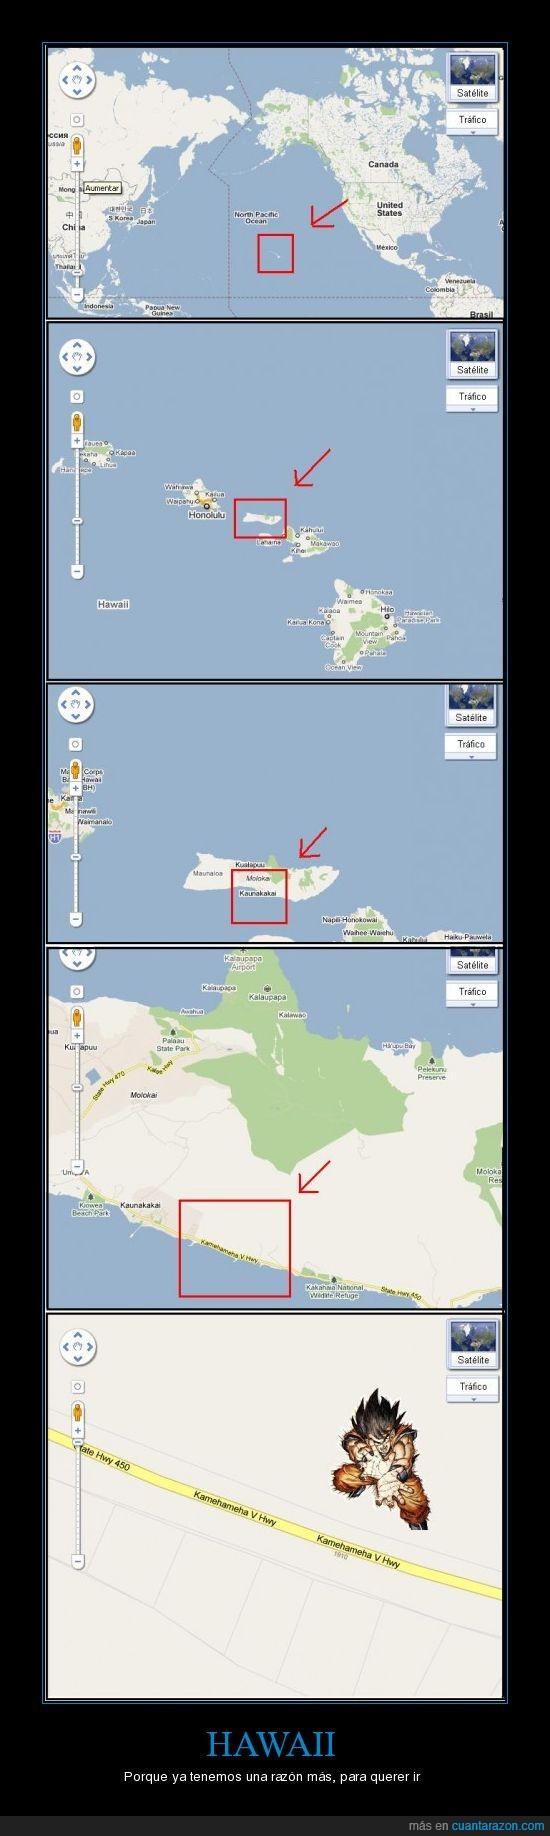 carretera,google maps,hawaii,kamehameha